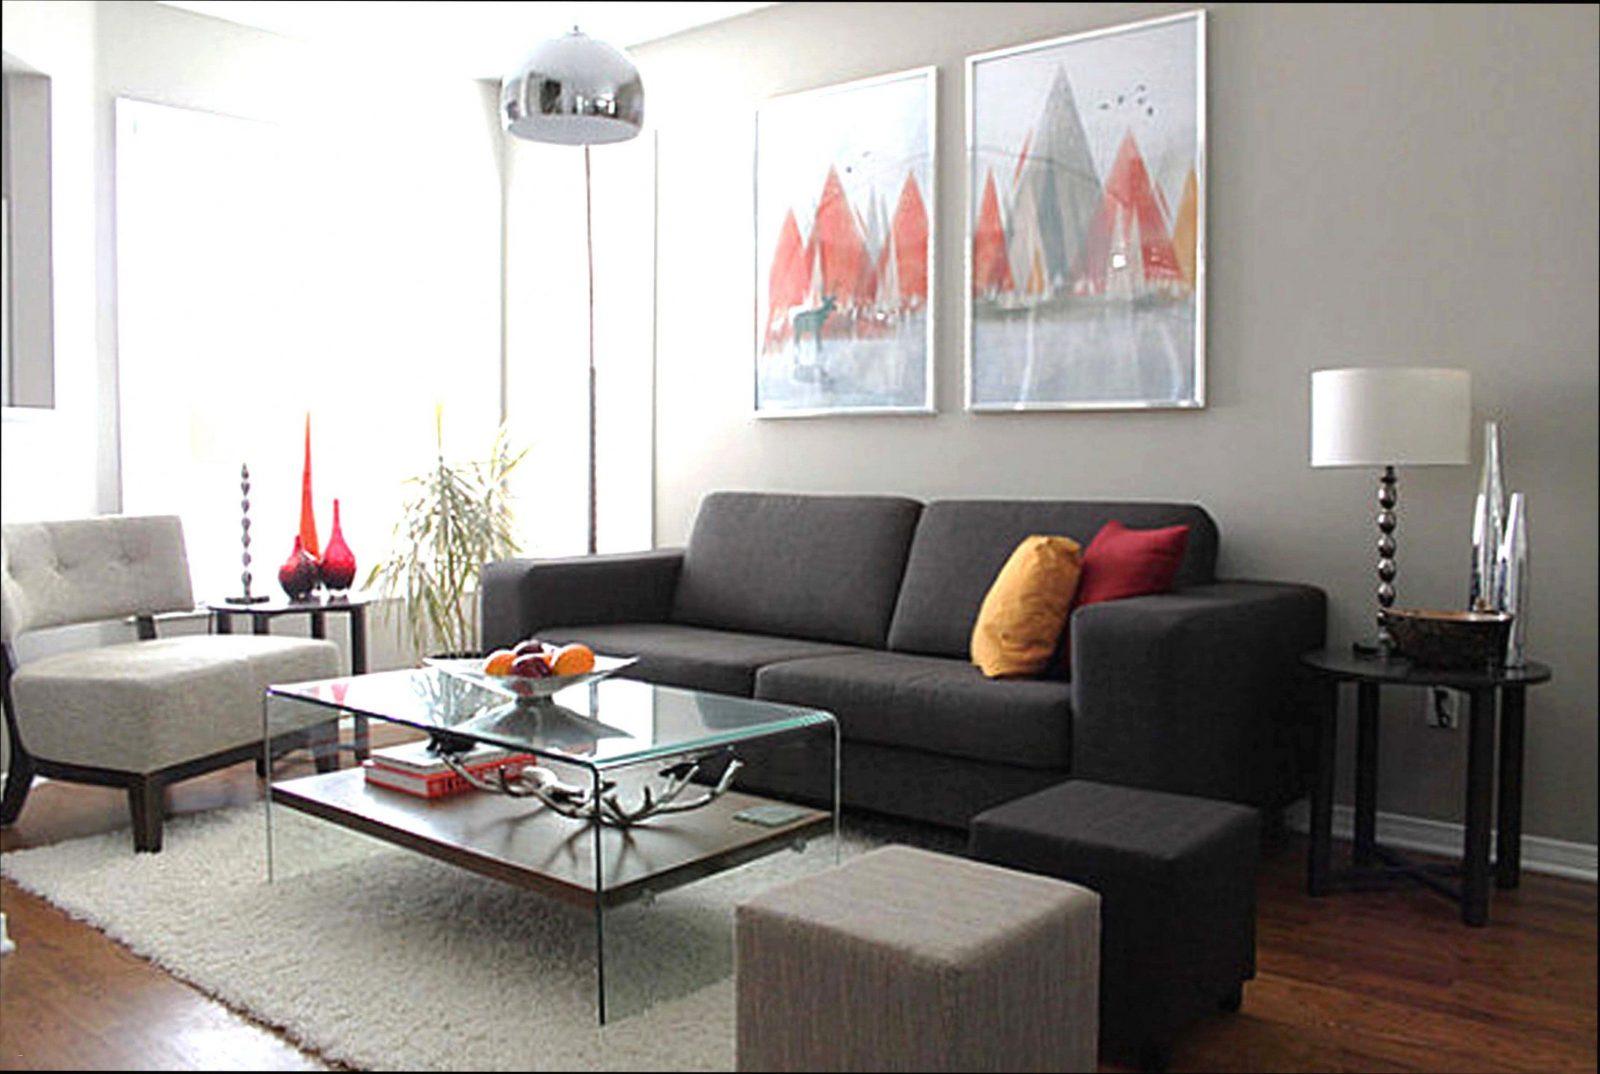 Graue Couch Wandfarbe Genial Attraktive Ideen Wandfarbe Wohnzimmer von Graues Sofa Welche Wandfarbe Photo